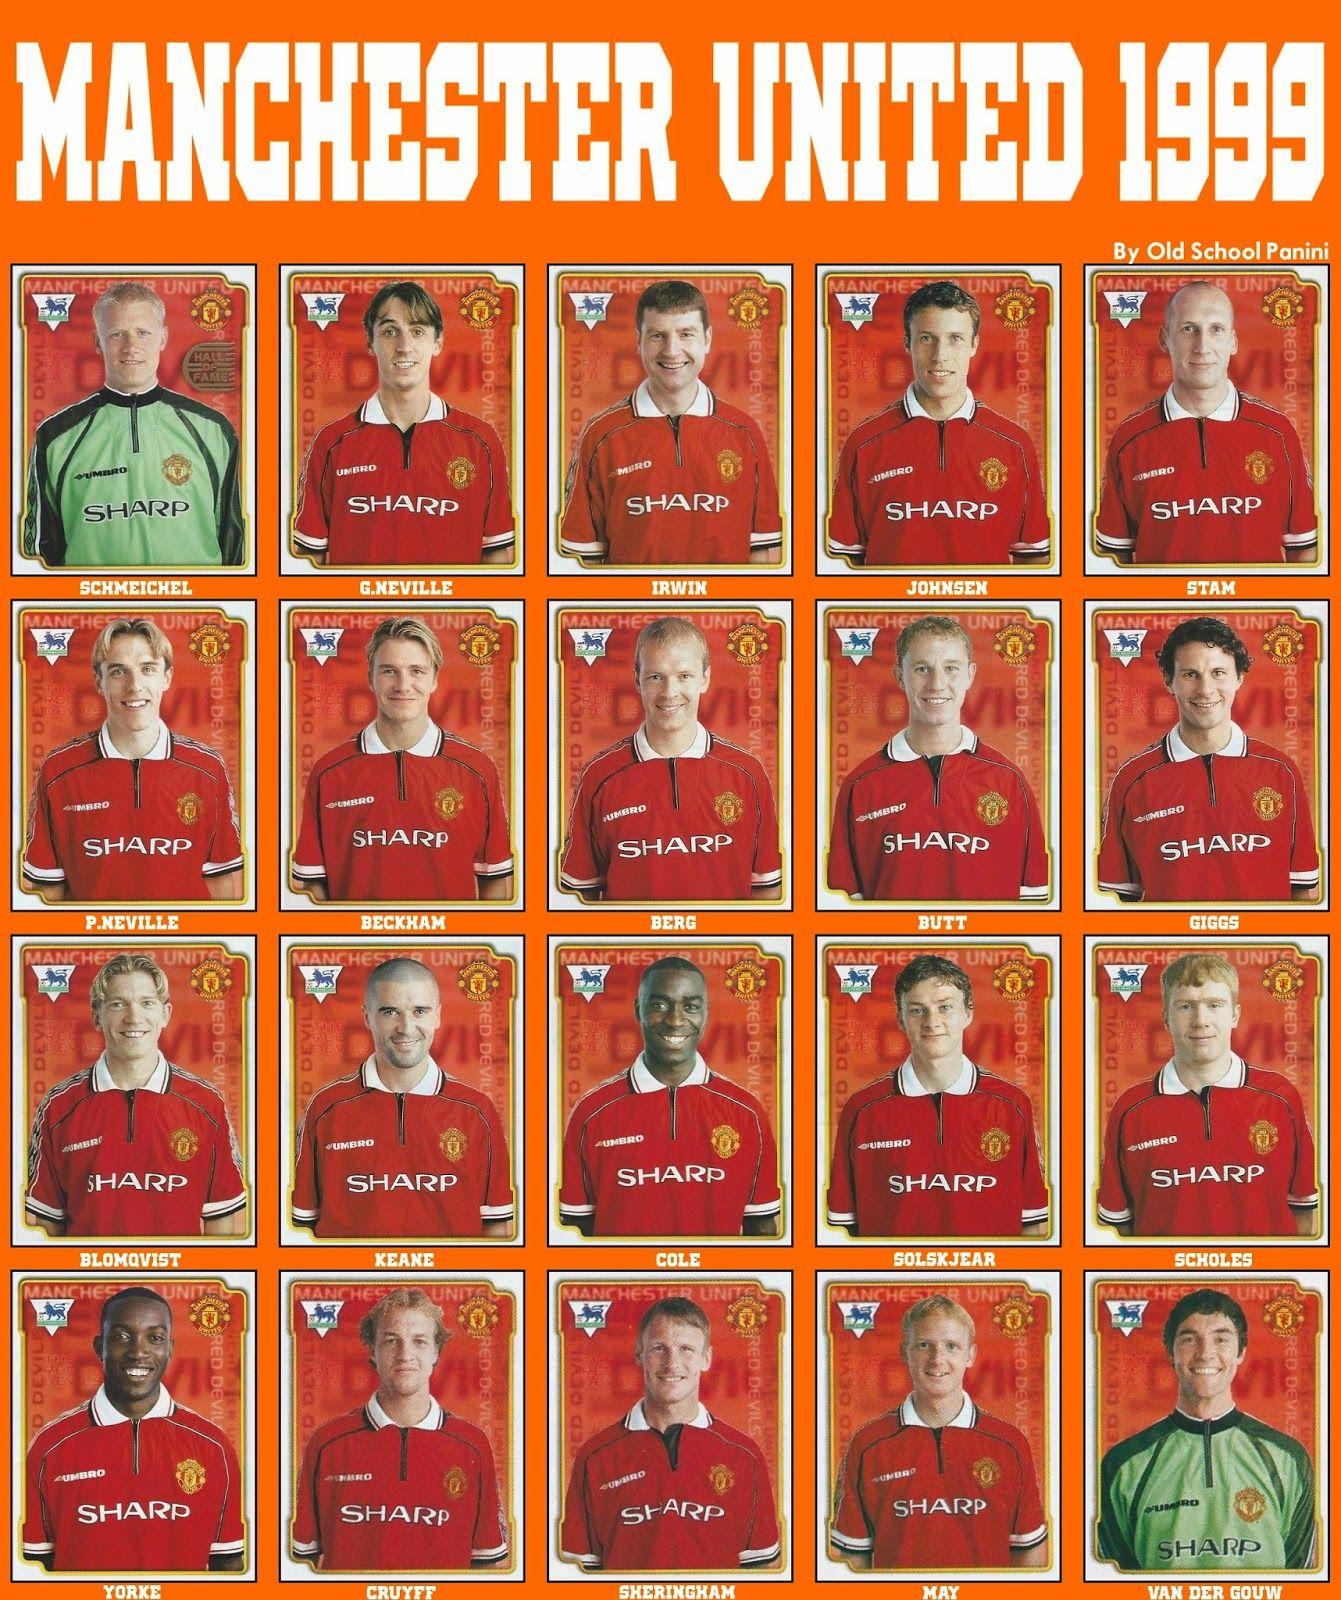 Old School Panini Manchester Utd Vs Bayern Munchen In 1999 Manchester United Legends Manchester United Team Manchester United